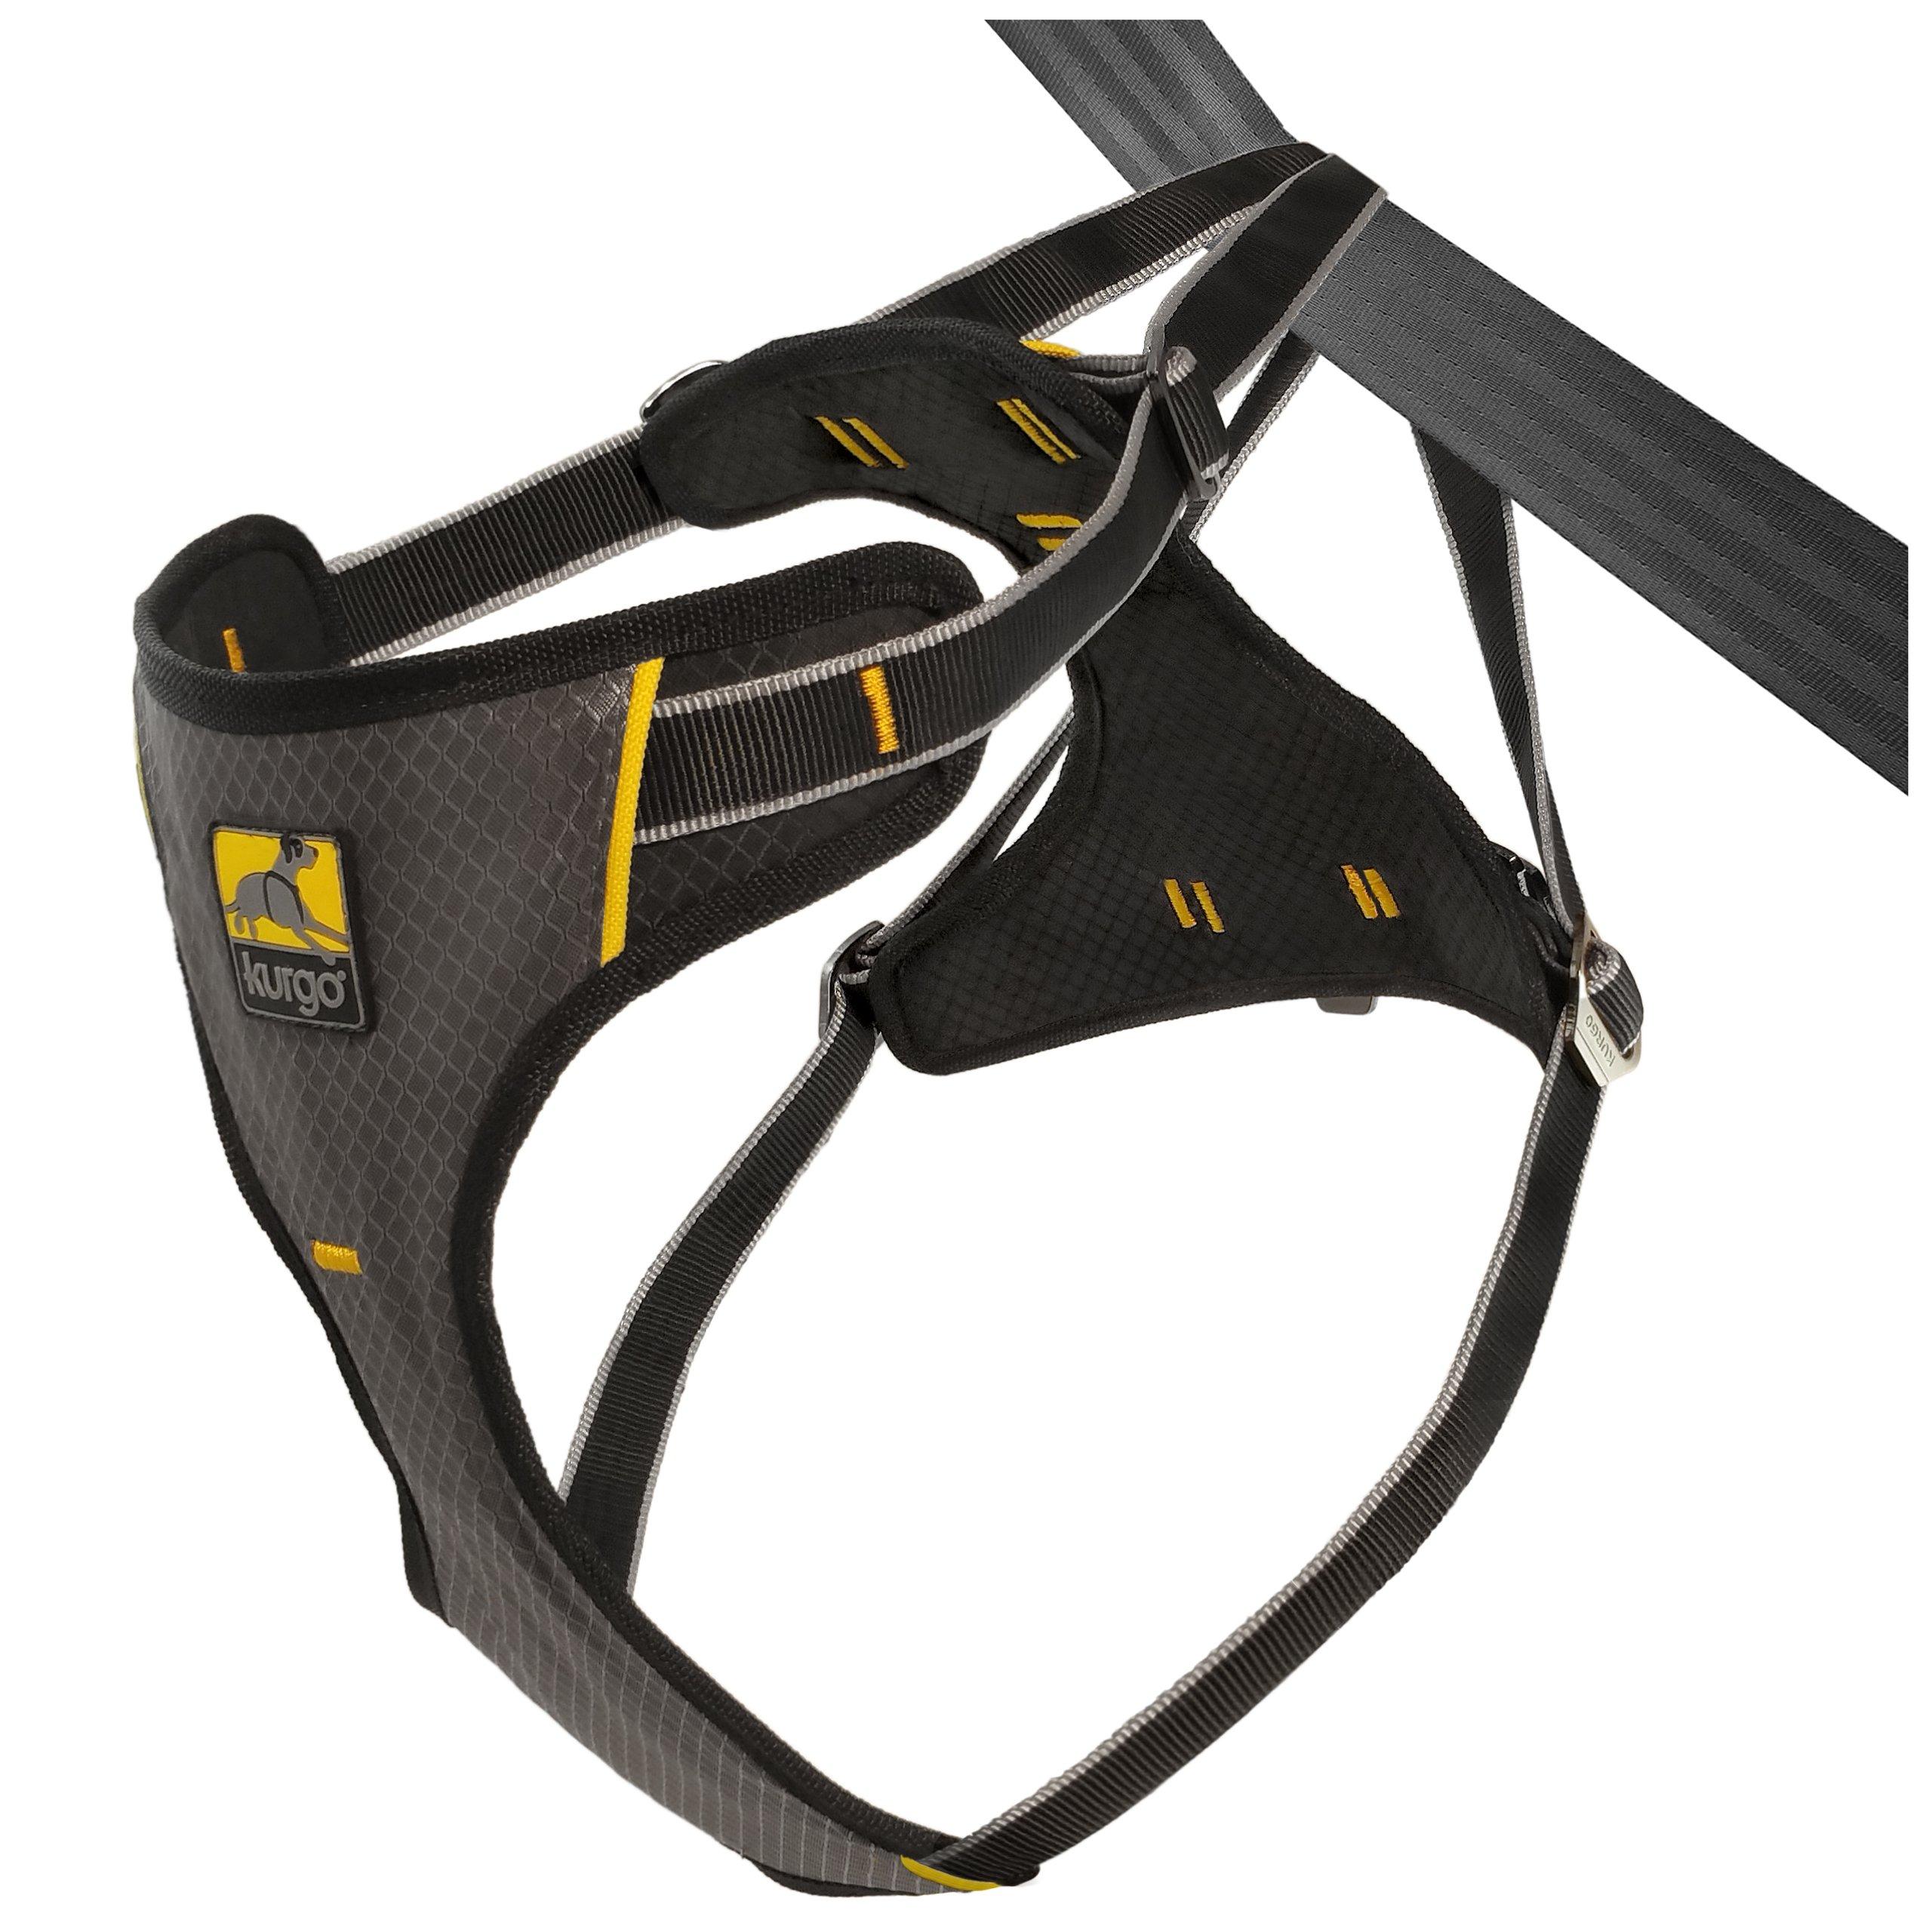 Kurgo Impact (TM) Dog Seat Belt Harness and Crash Tested Dog Harness up to 130 lbs, Black, Medium